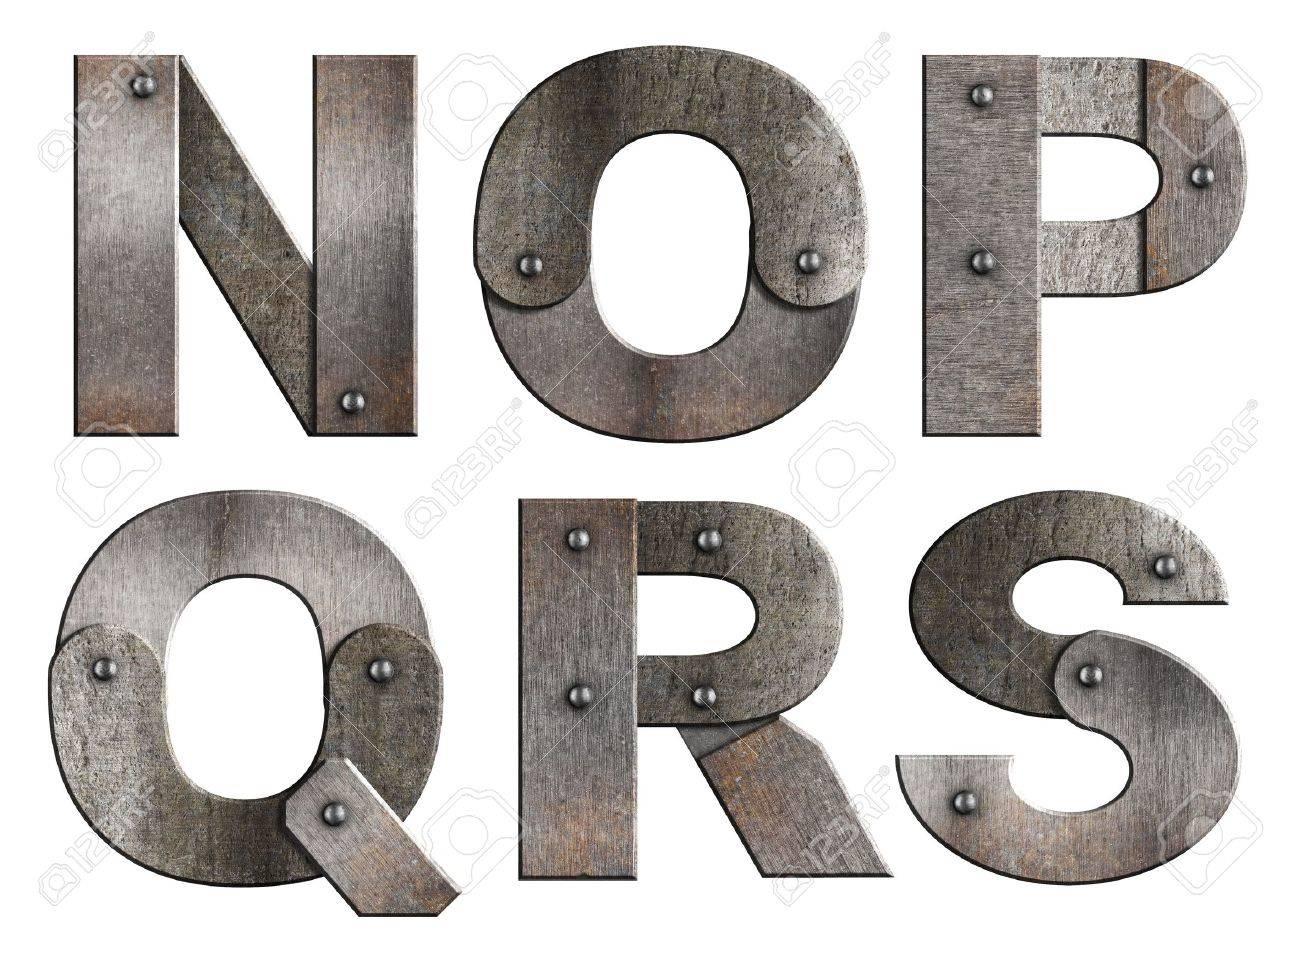 6 Inch Metal Letters 100  Metal Letters   Rustic U0026 Rusty Metal Letters 6 Inch